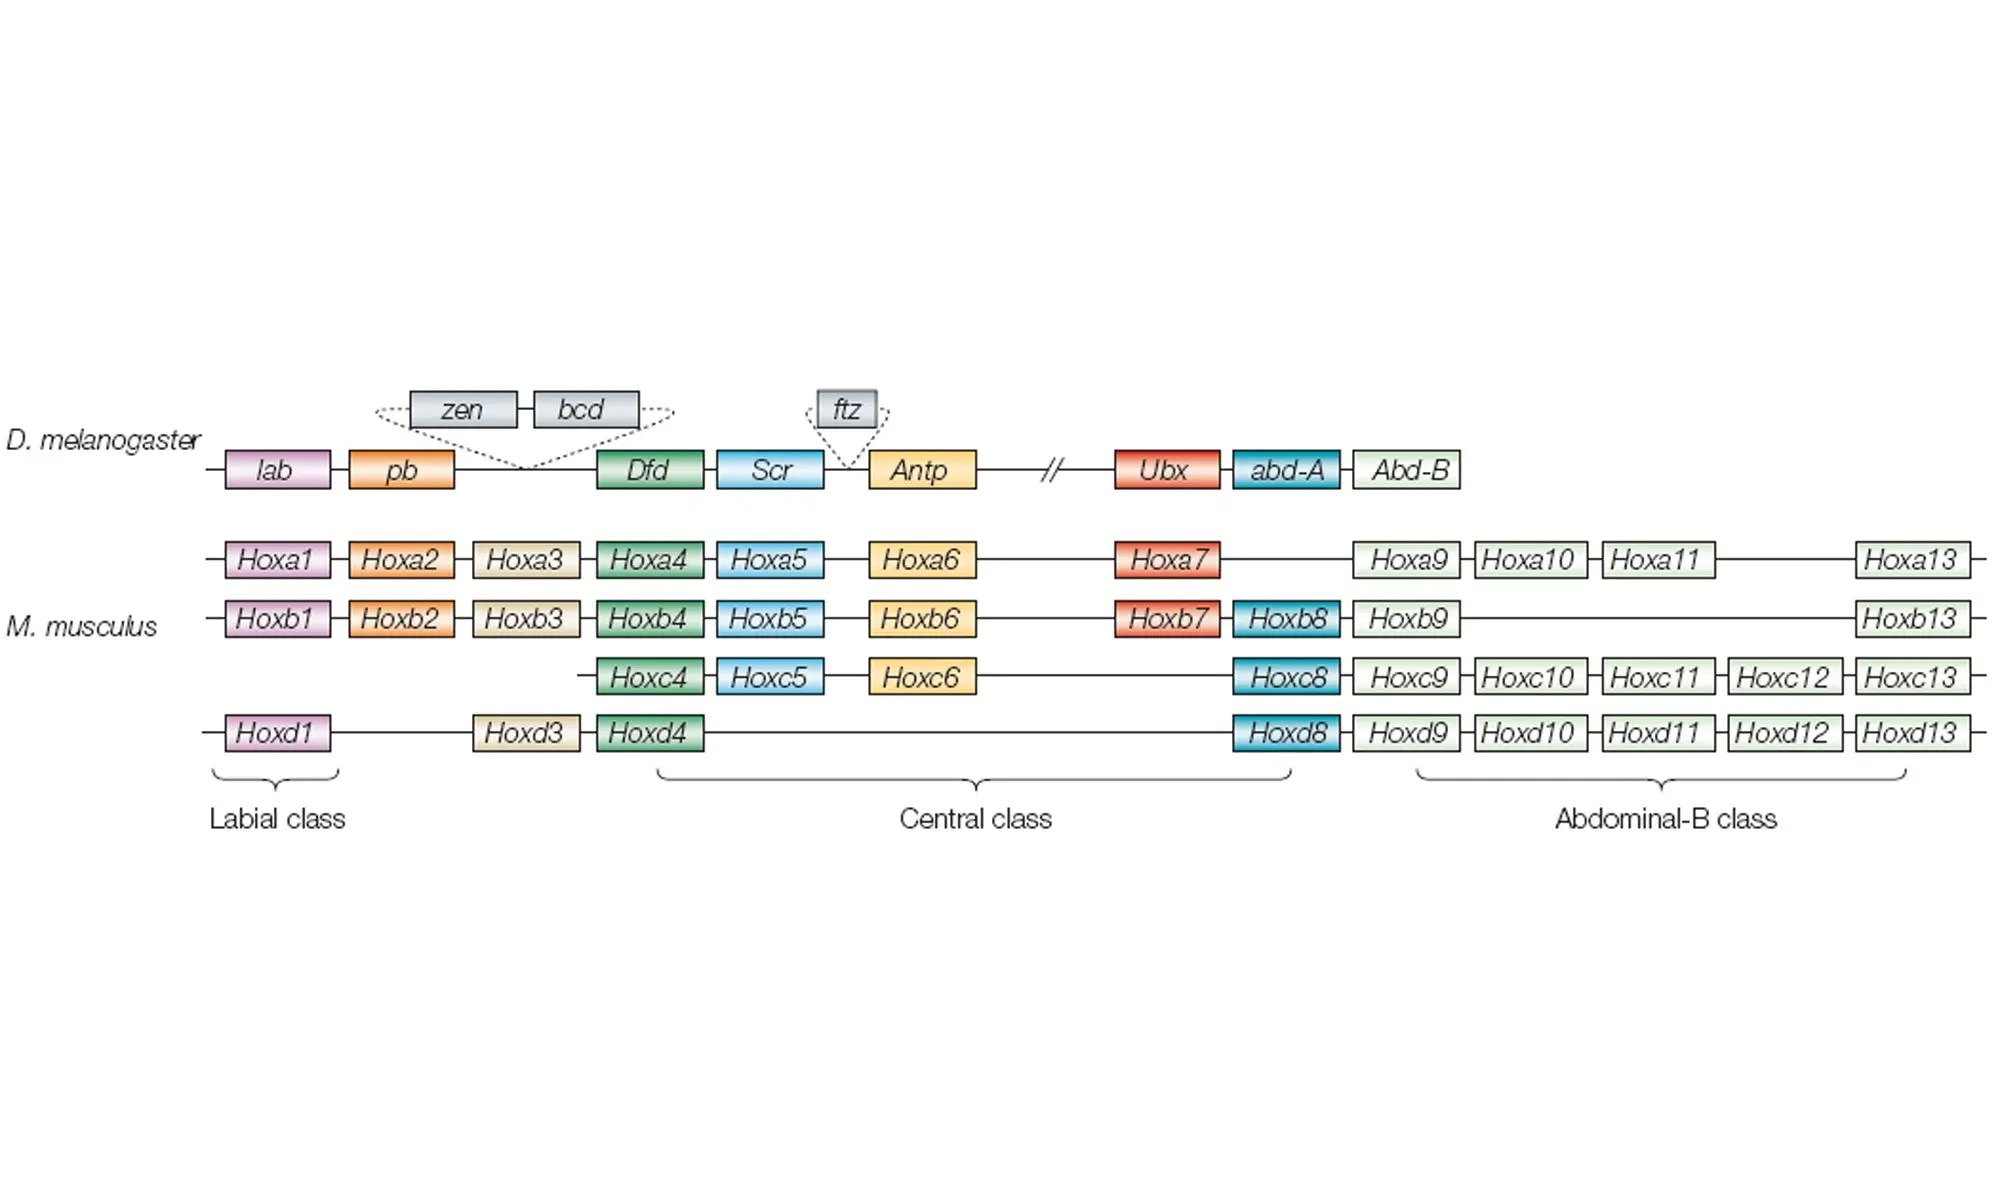 image of hox genes